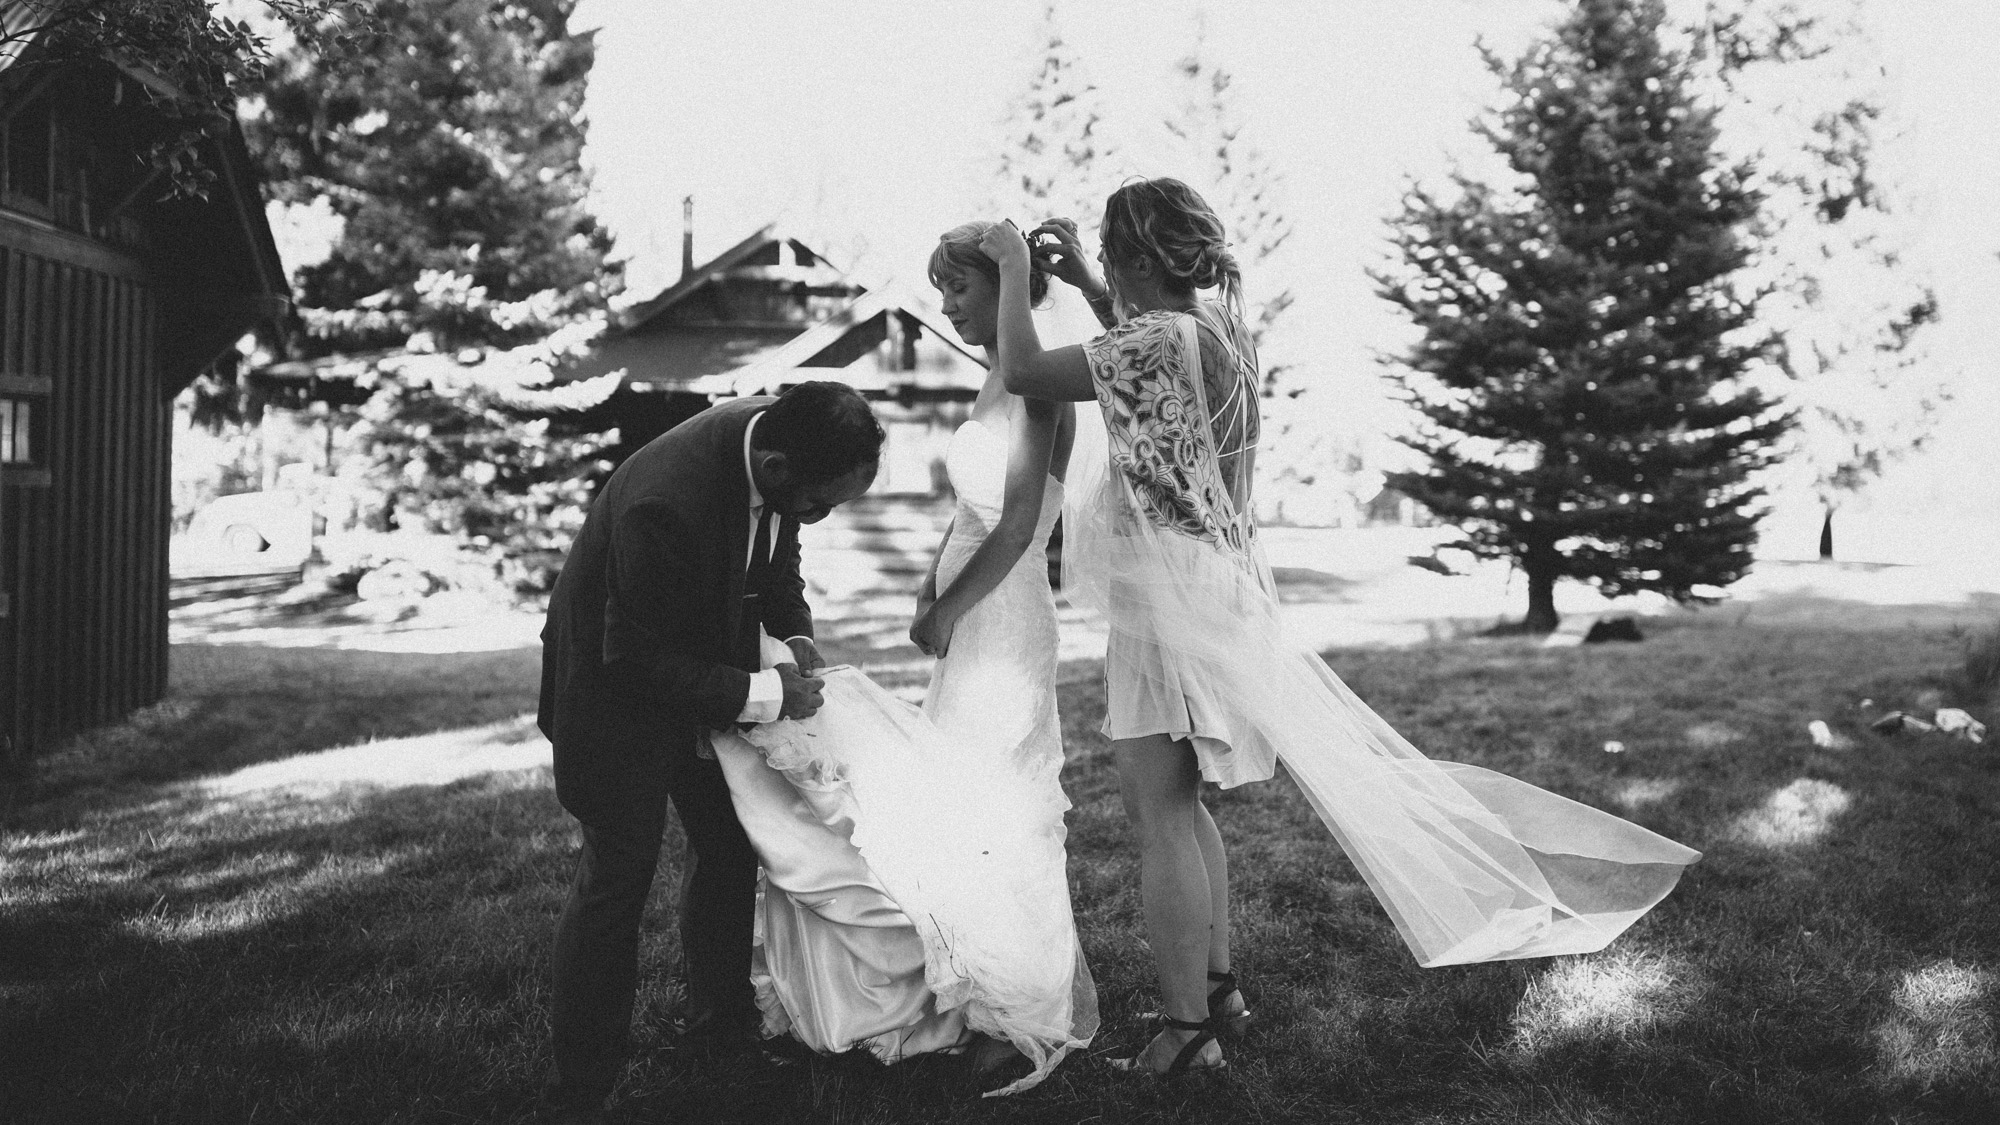 Montana_Wedding_Photos_alec_vanderboom-0115.jpg